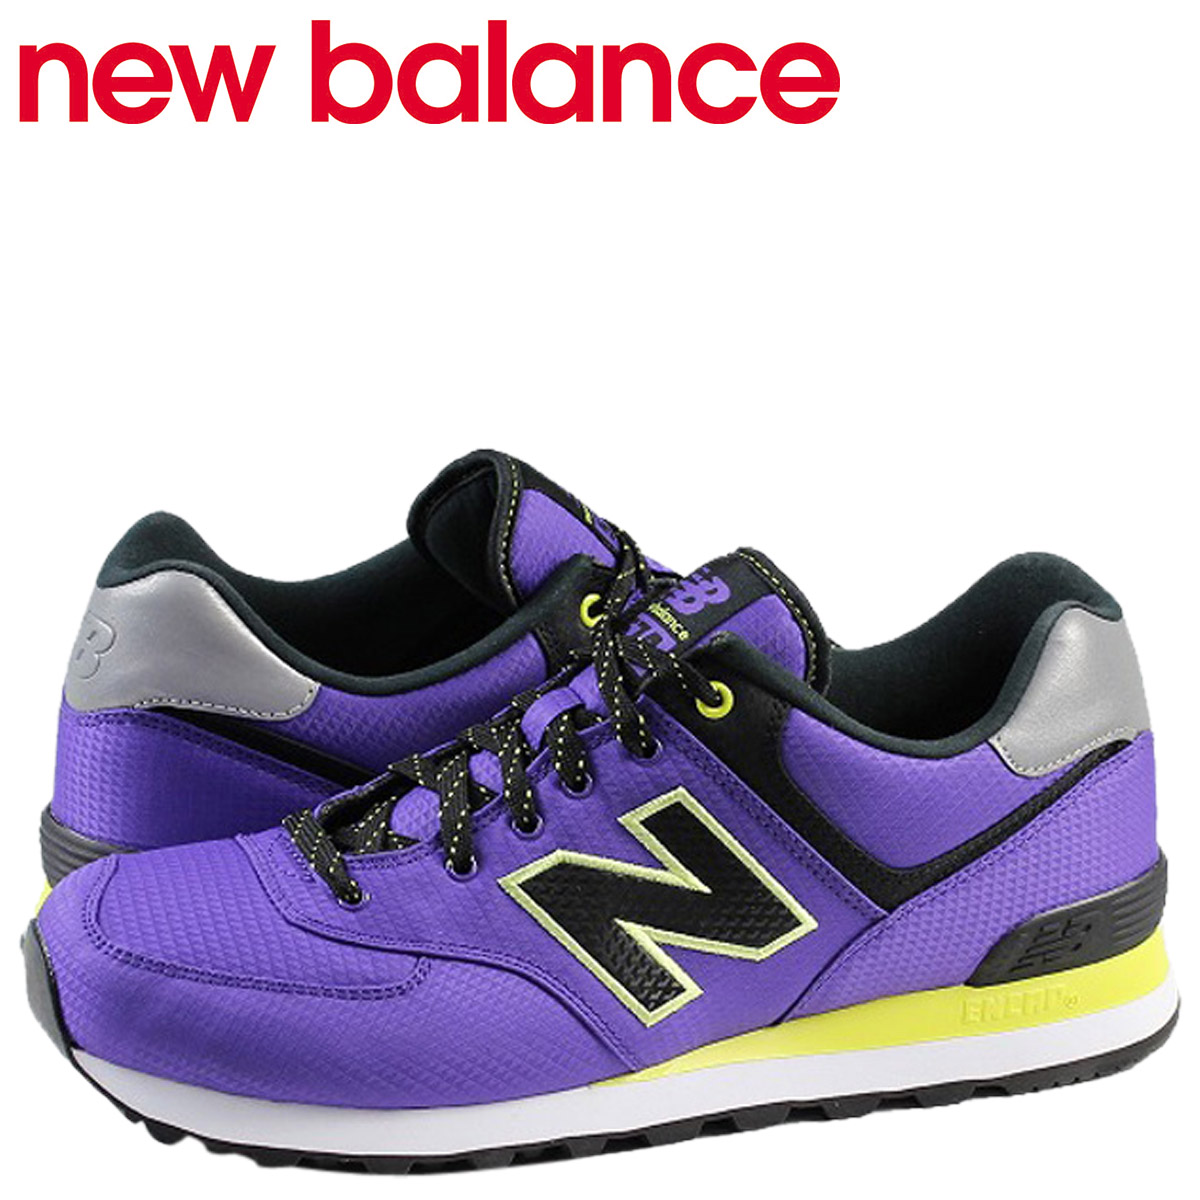 new balance 574 violet